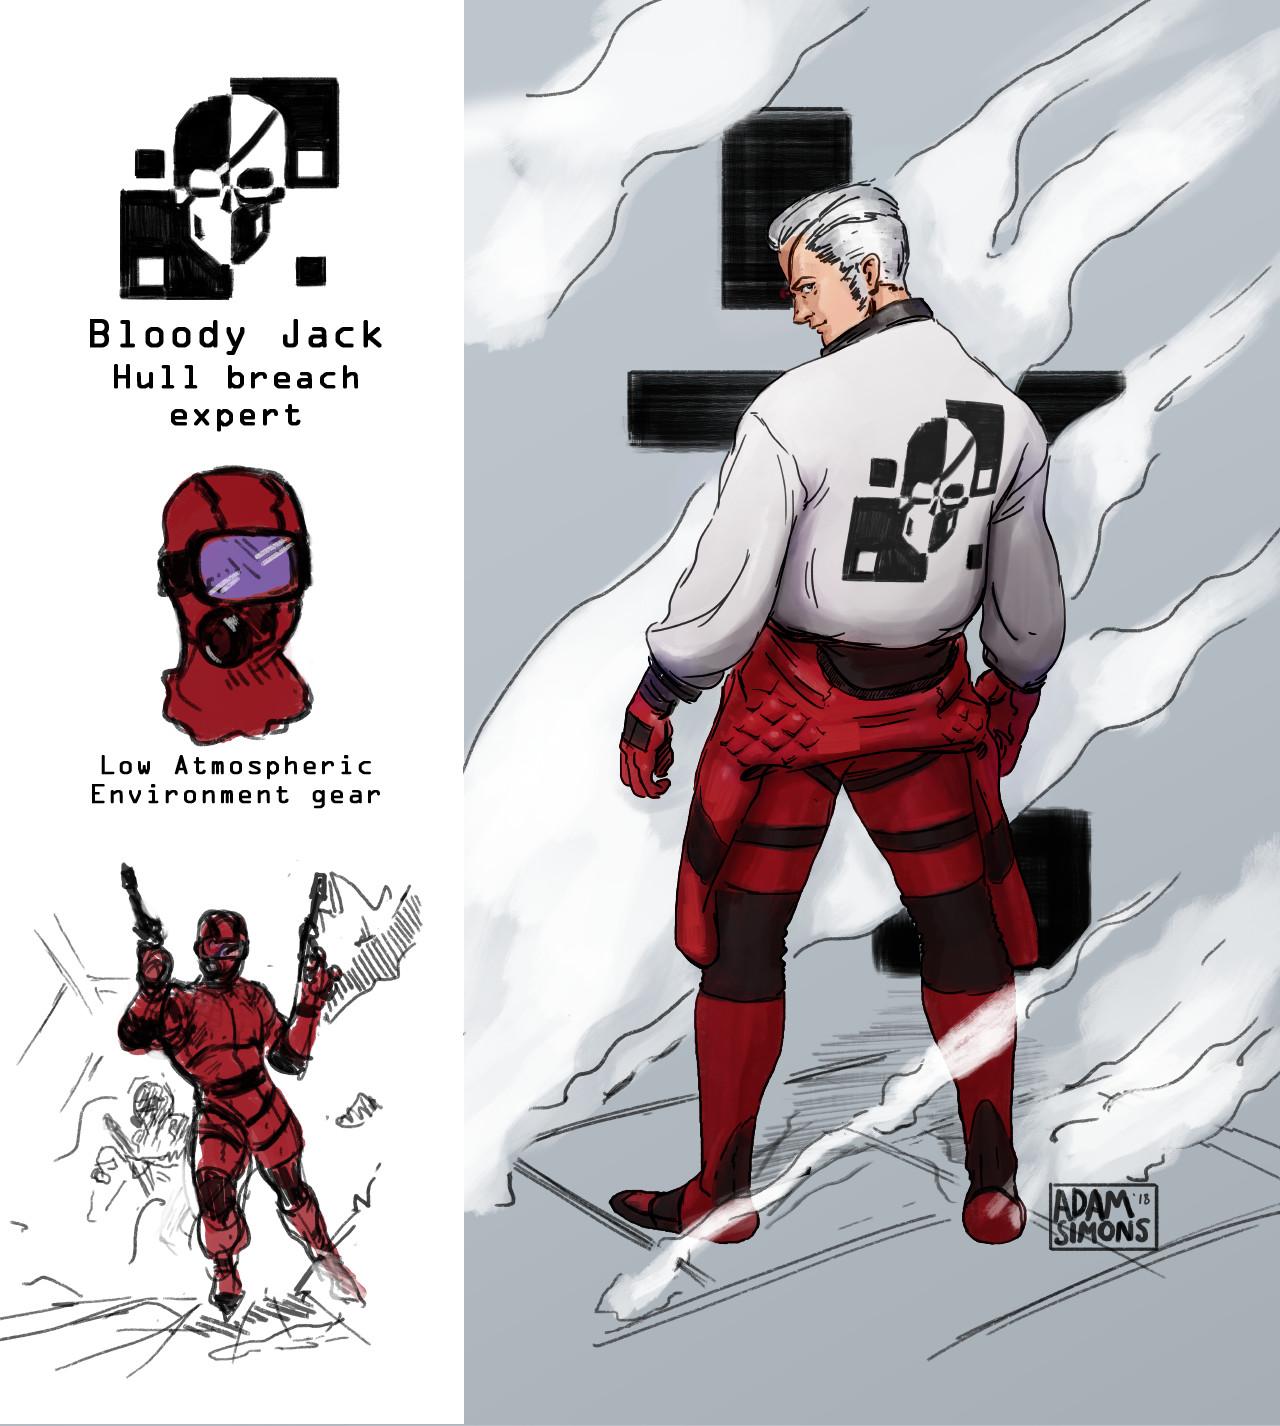 CDC Bloody Jack